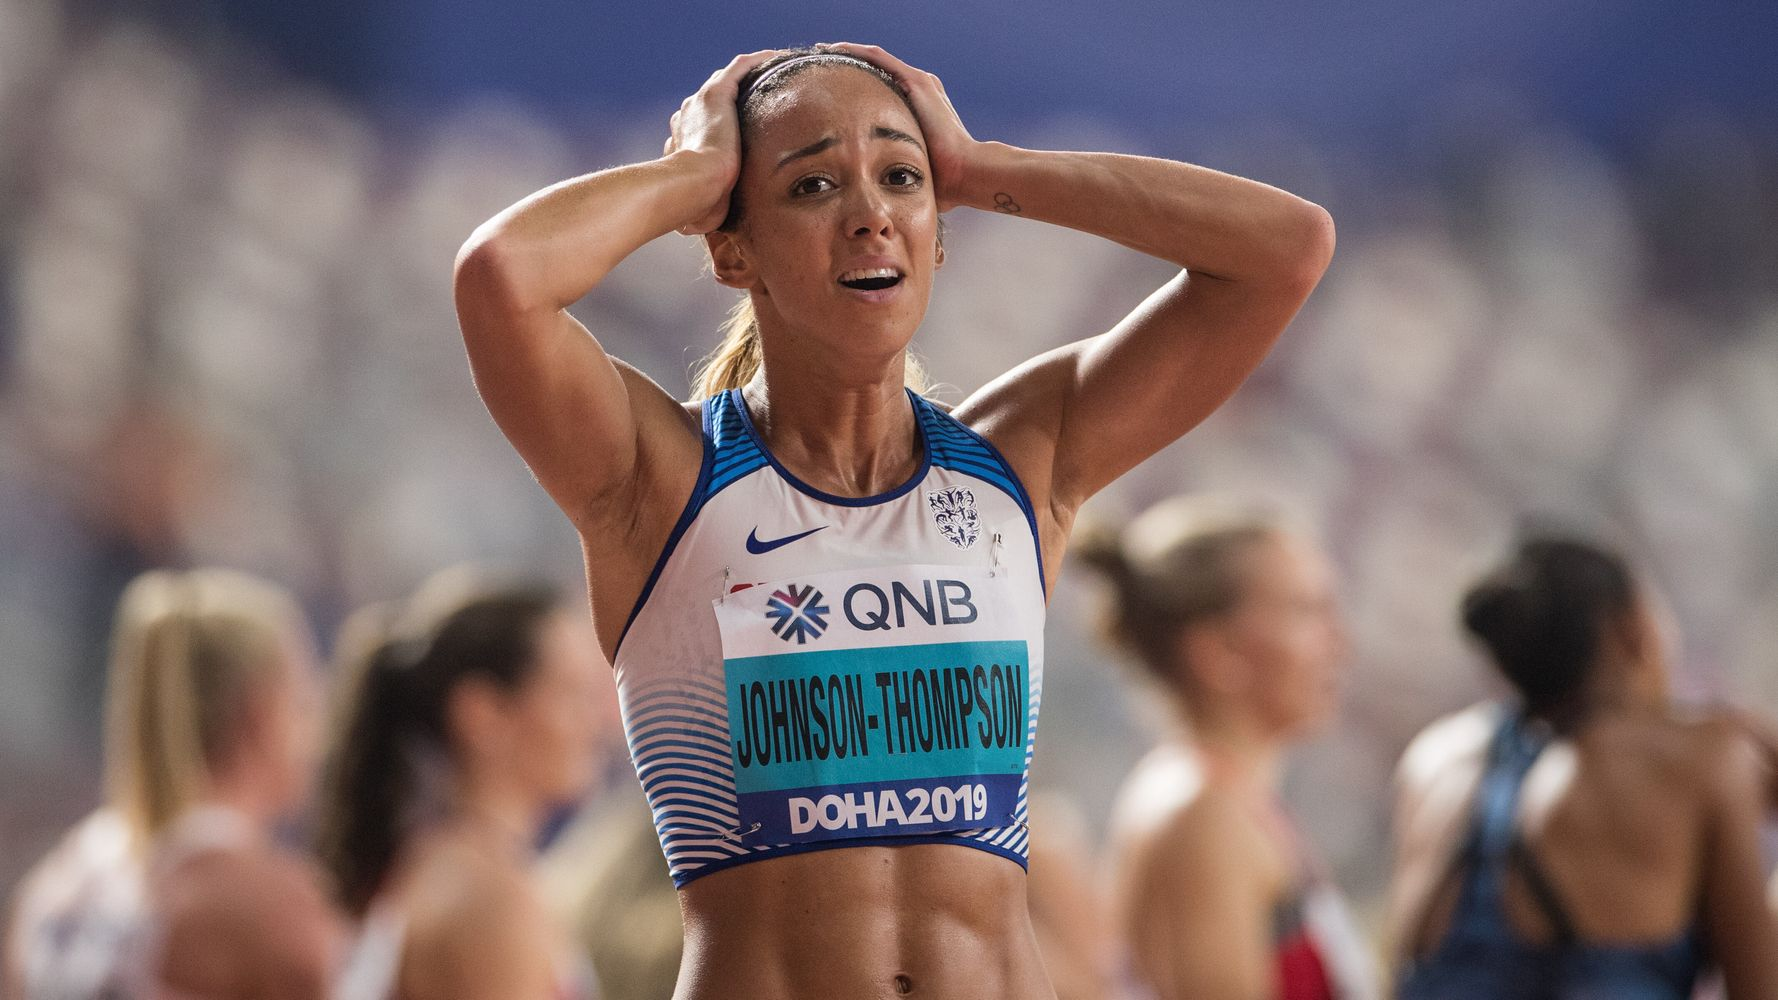 From Katarina Johnson-Thompson To Dina Asher-Smith, 6 Women Athletes Whose Words Make Us Dream Big